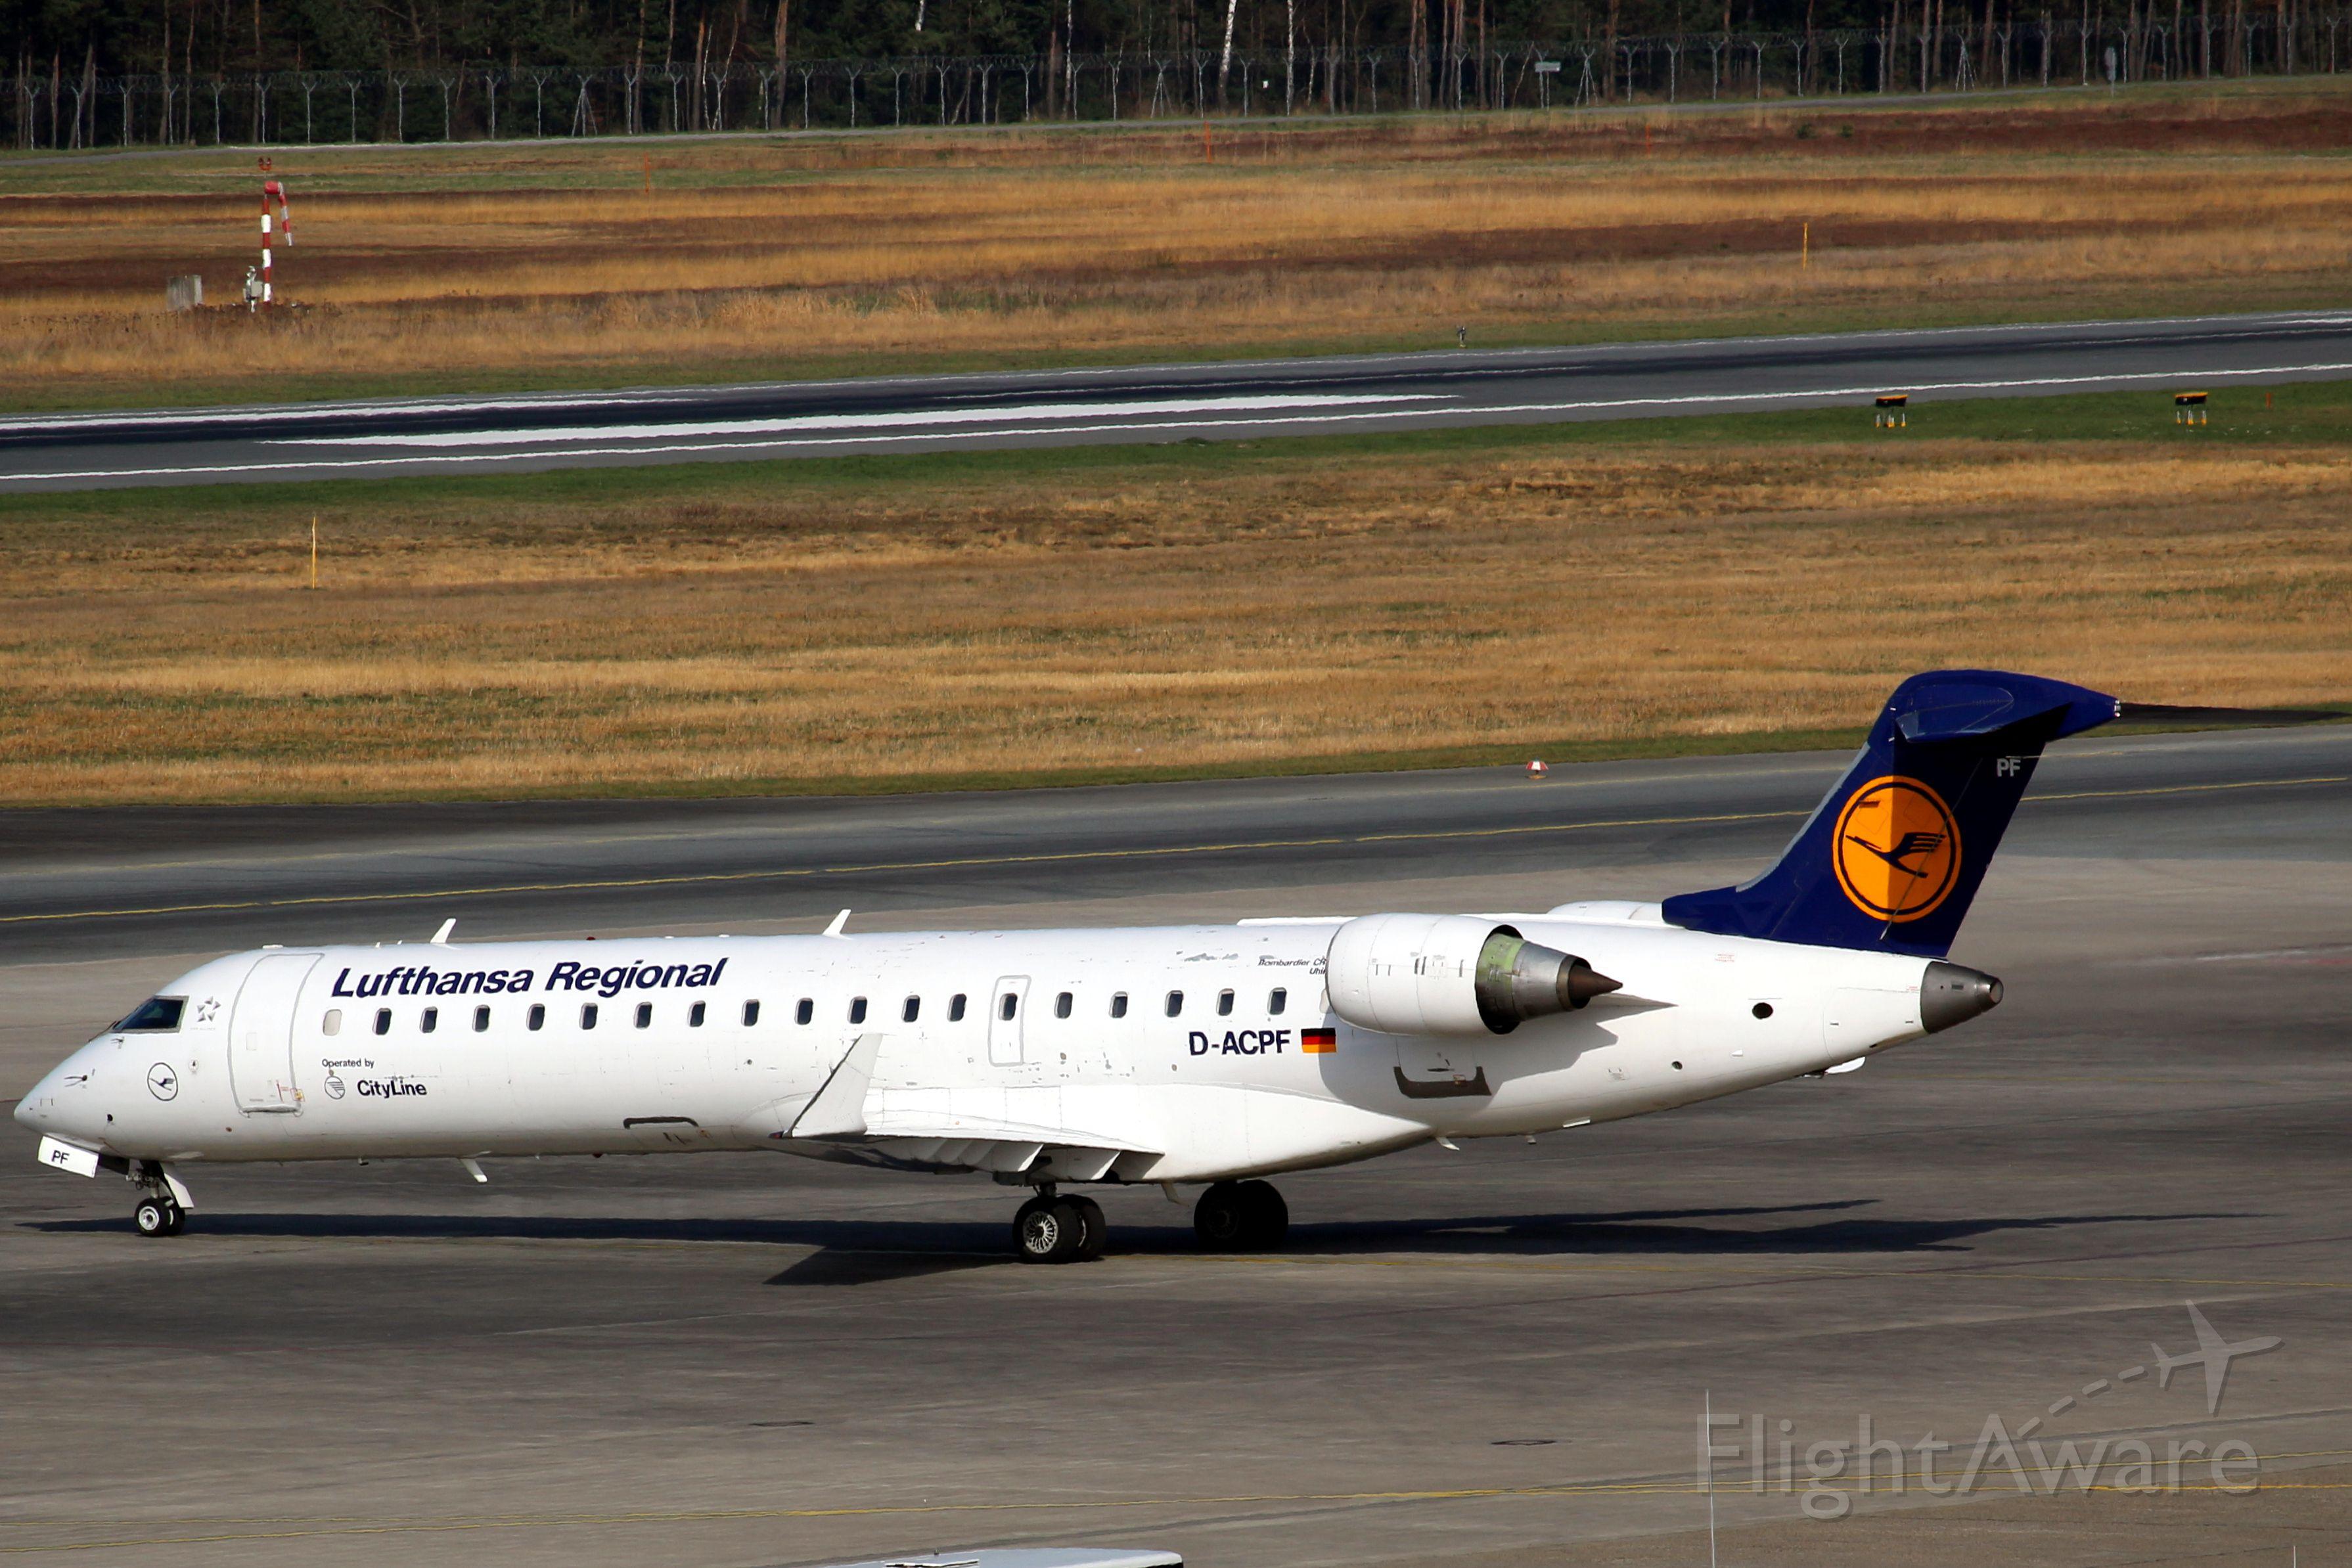 Canadair Regional Jet CRJ-700 (D-ACPF)